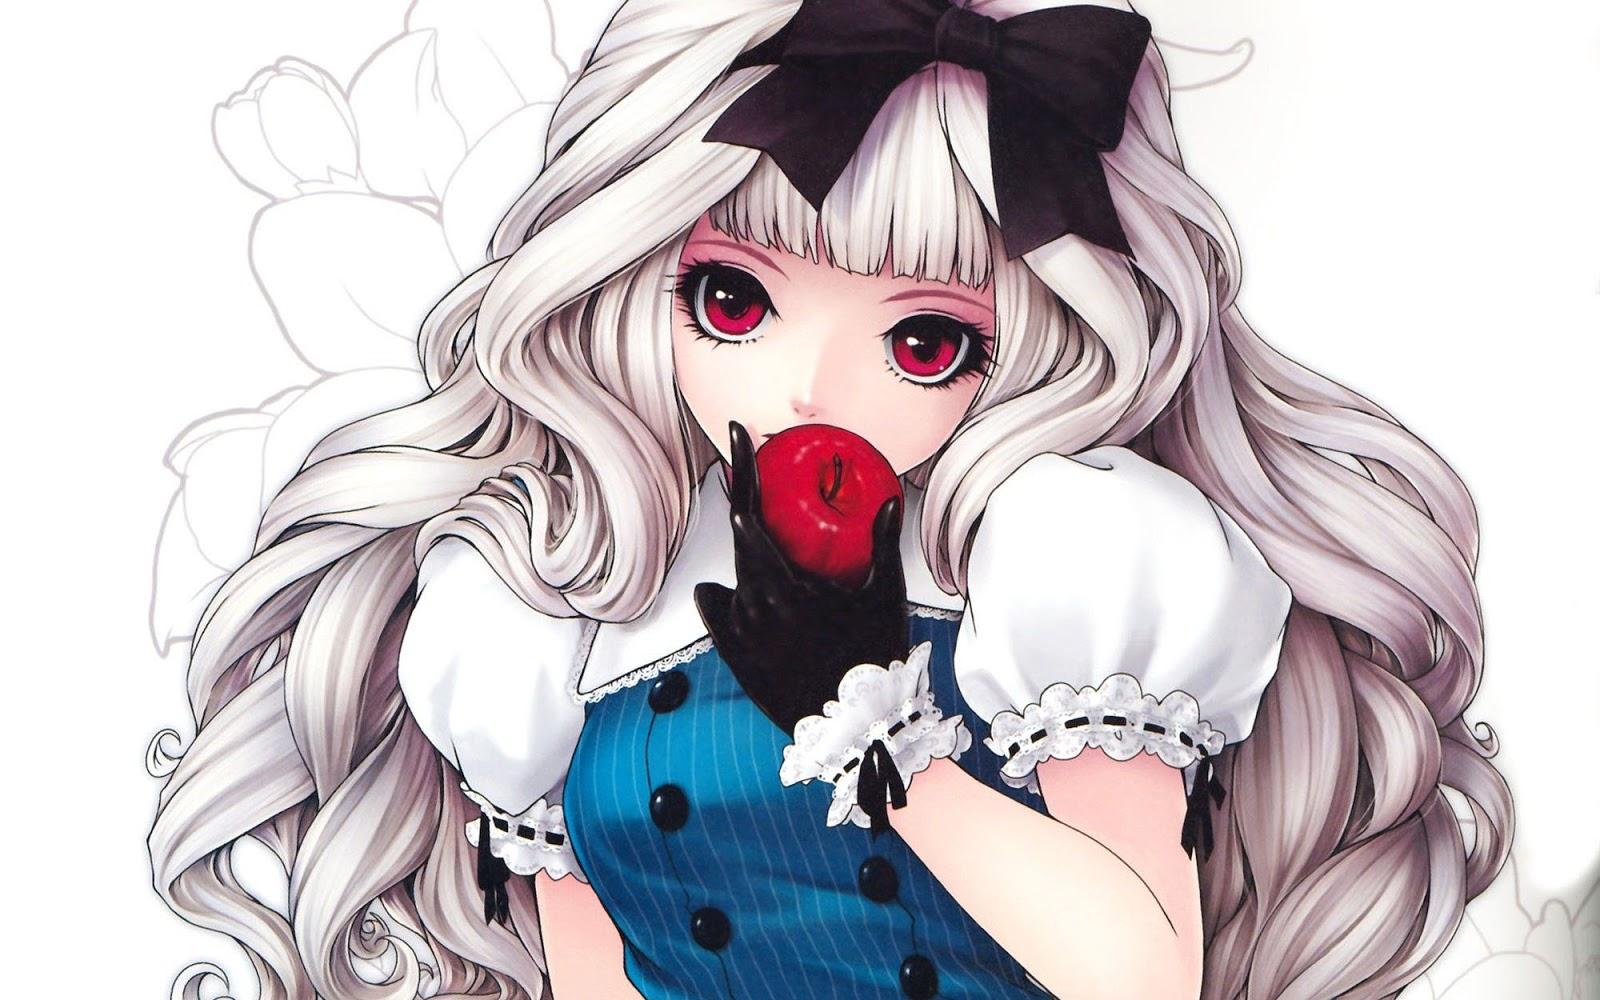 Anime Cute White Long Hair Red Eye Eating Apple HD Wallpaper Desktop 1600x1000